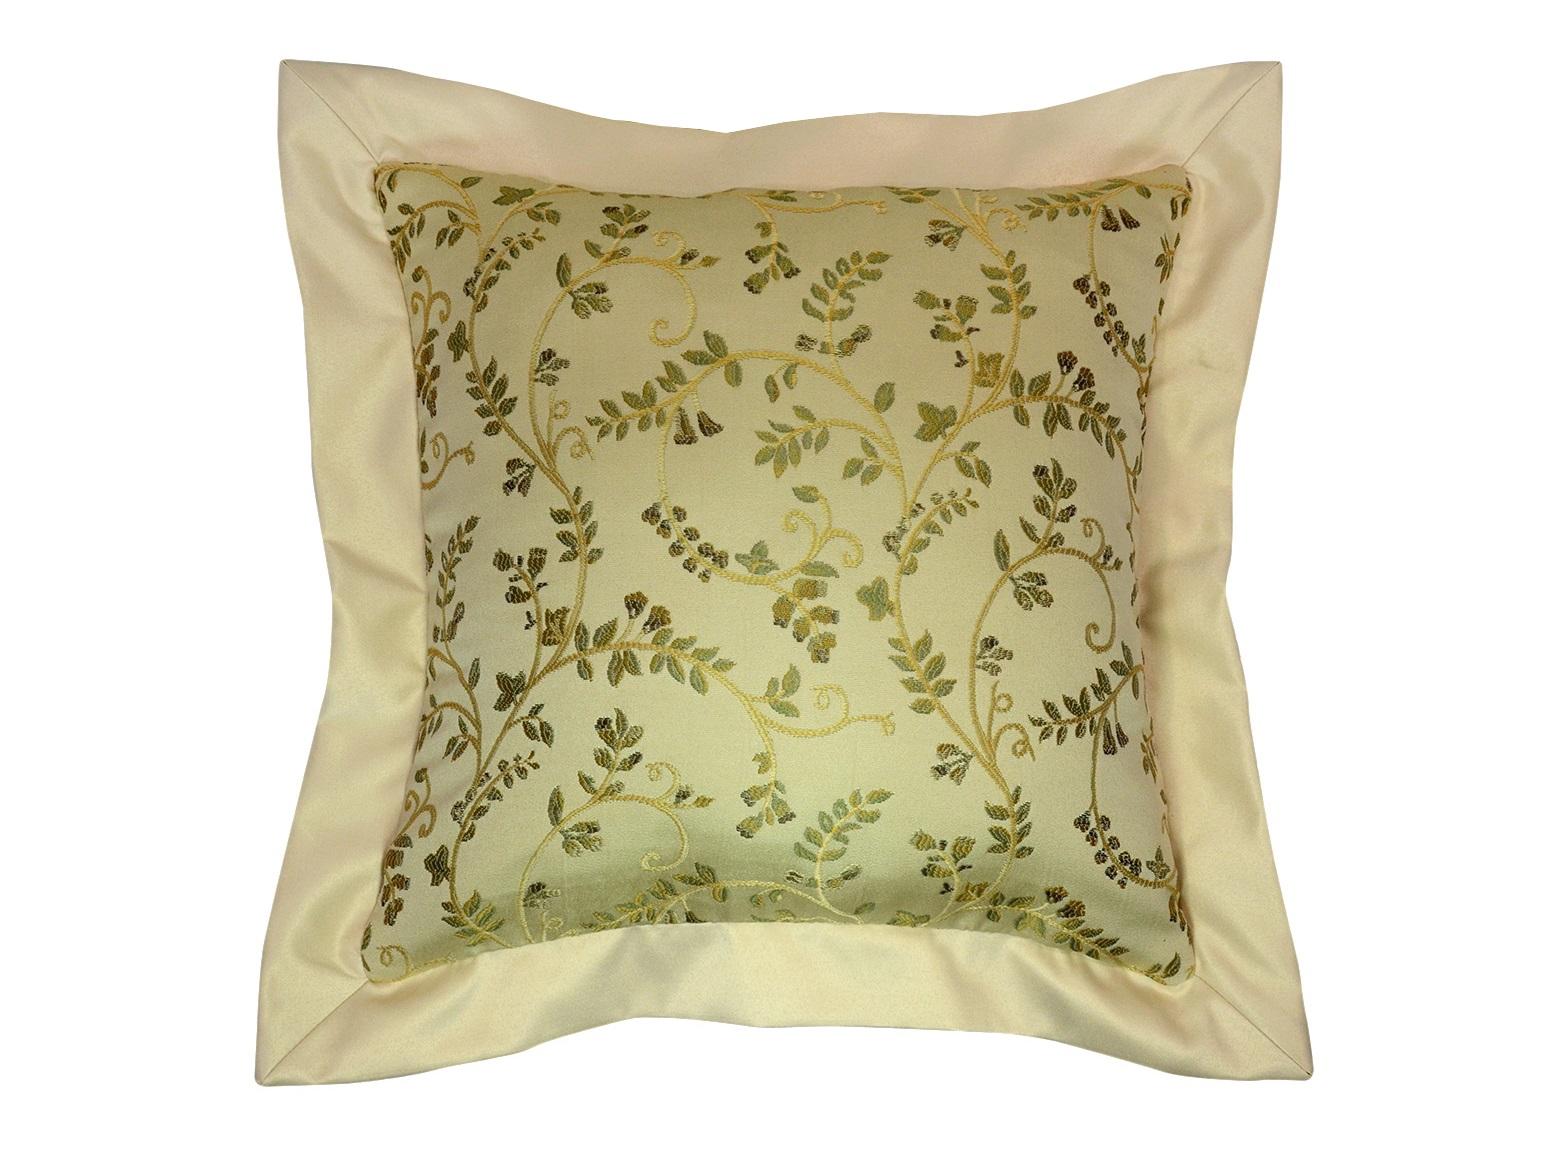 Подушка Arabelle GreenКвадратные подушки<br>Декоративная  подушка .Чехол съемный.<br><br>Material: Вискоза<br>Length см: None<br>Width см: 50<br>Depth см: 15<br>Height см: 50